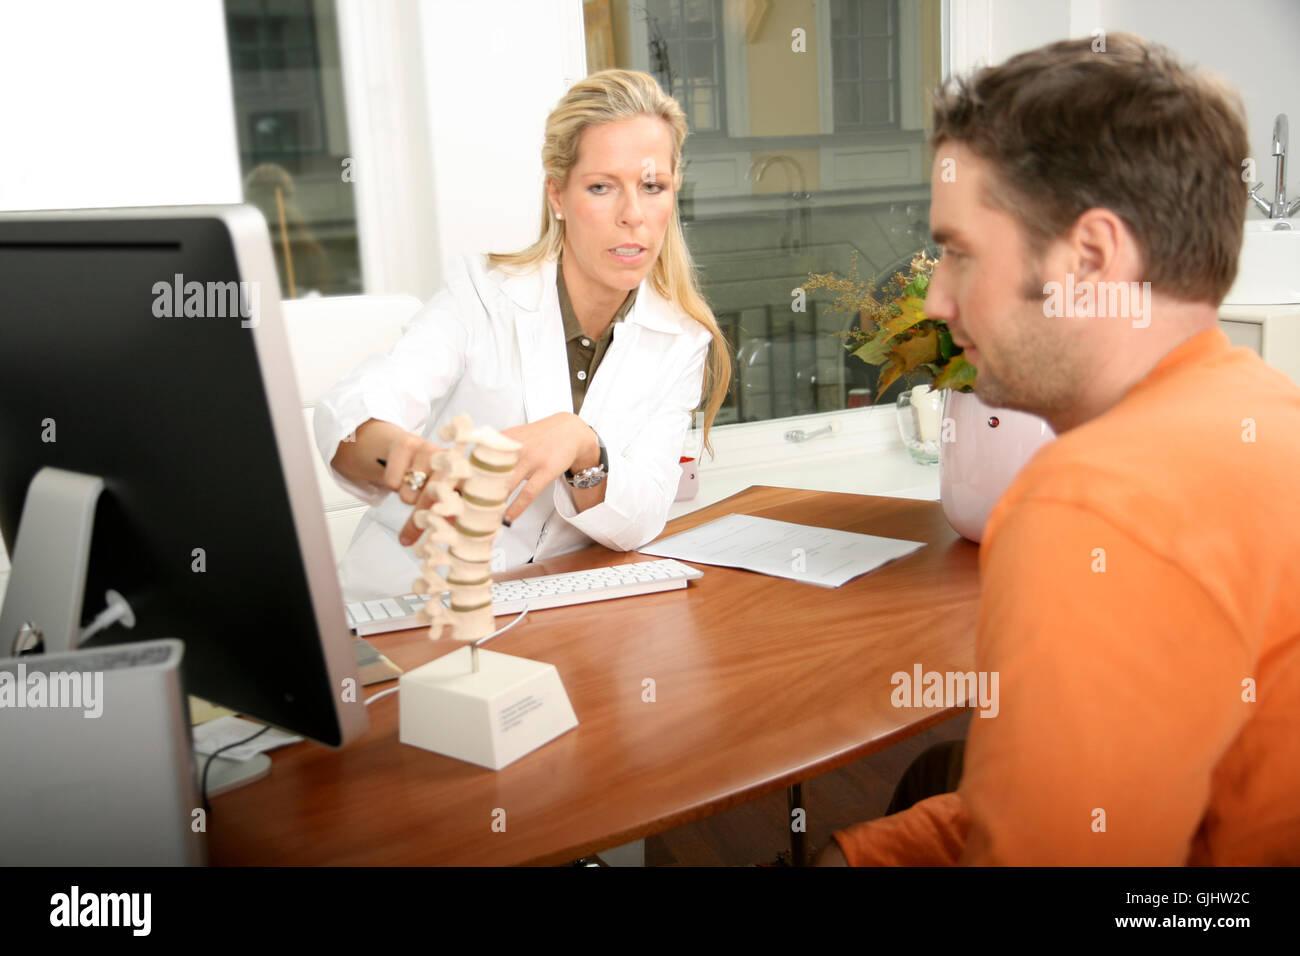 doctor talks - Stock Image